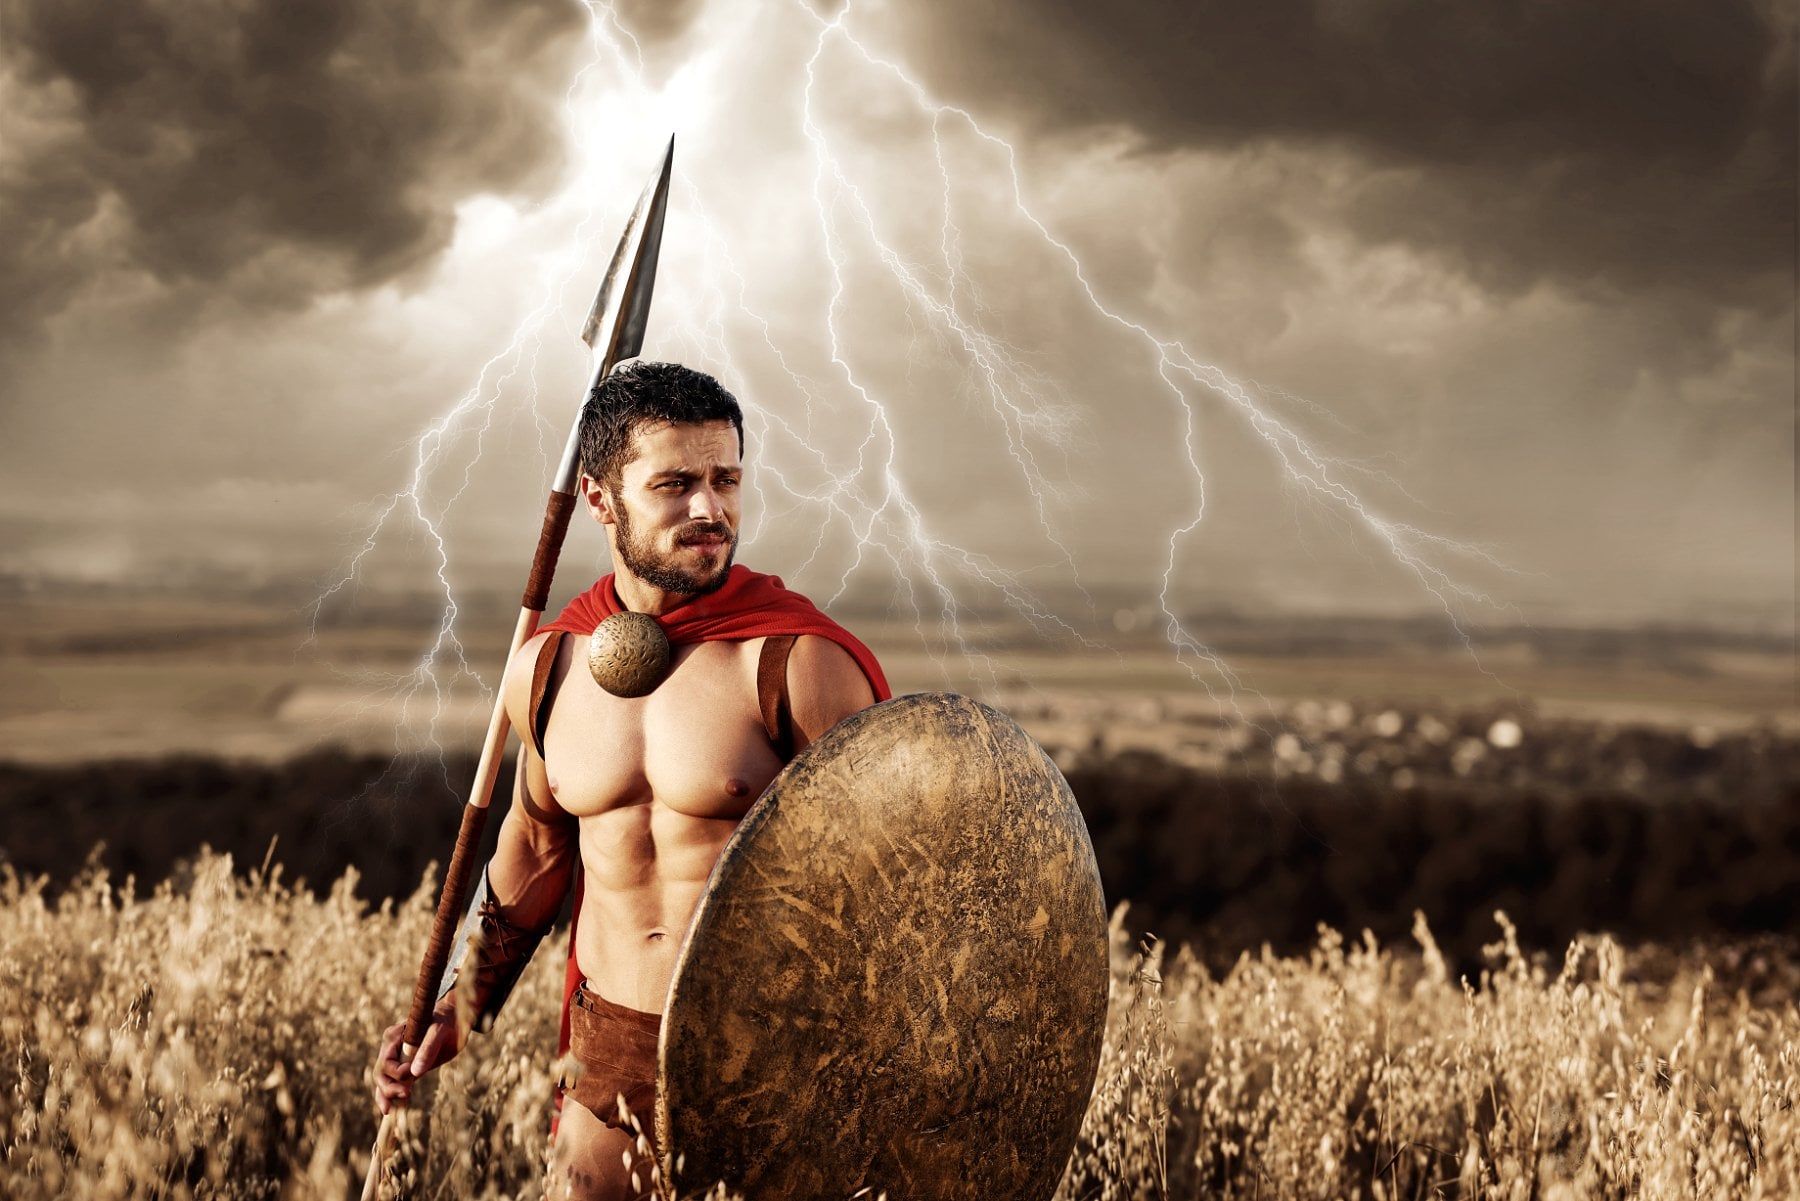 160+ Realistic Lightning Overlays - $15 - fotolia 136543242 subscription monthly xxl min